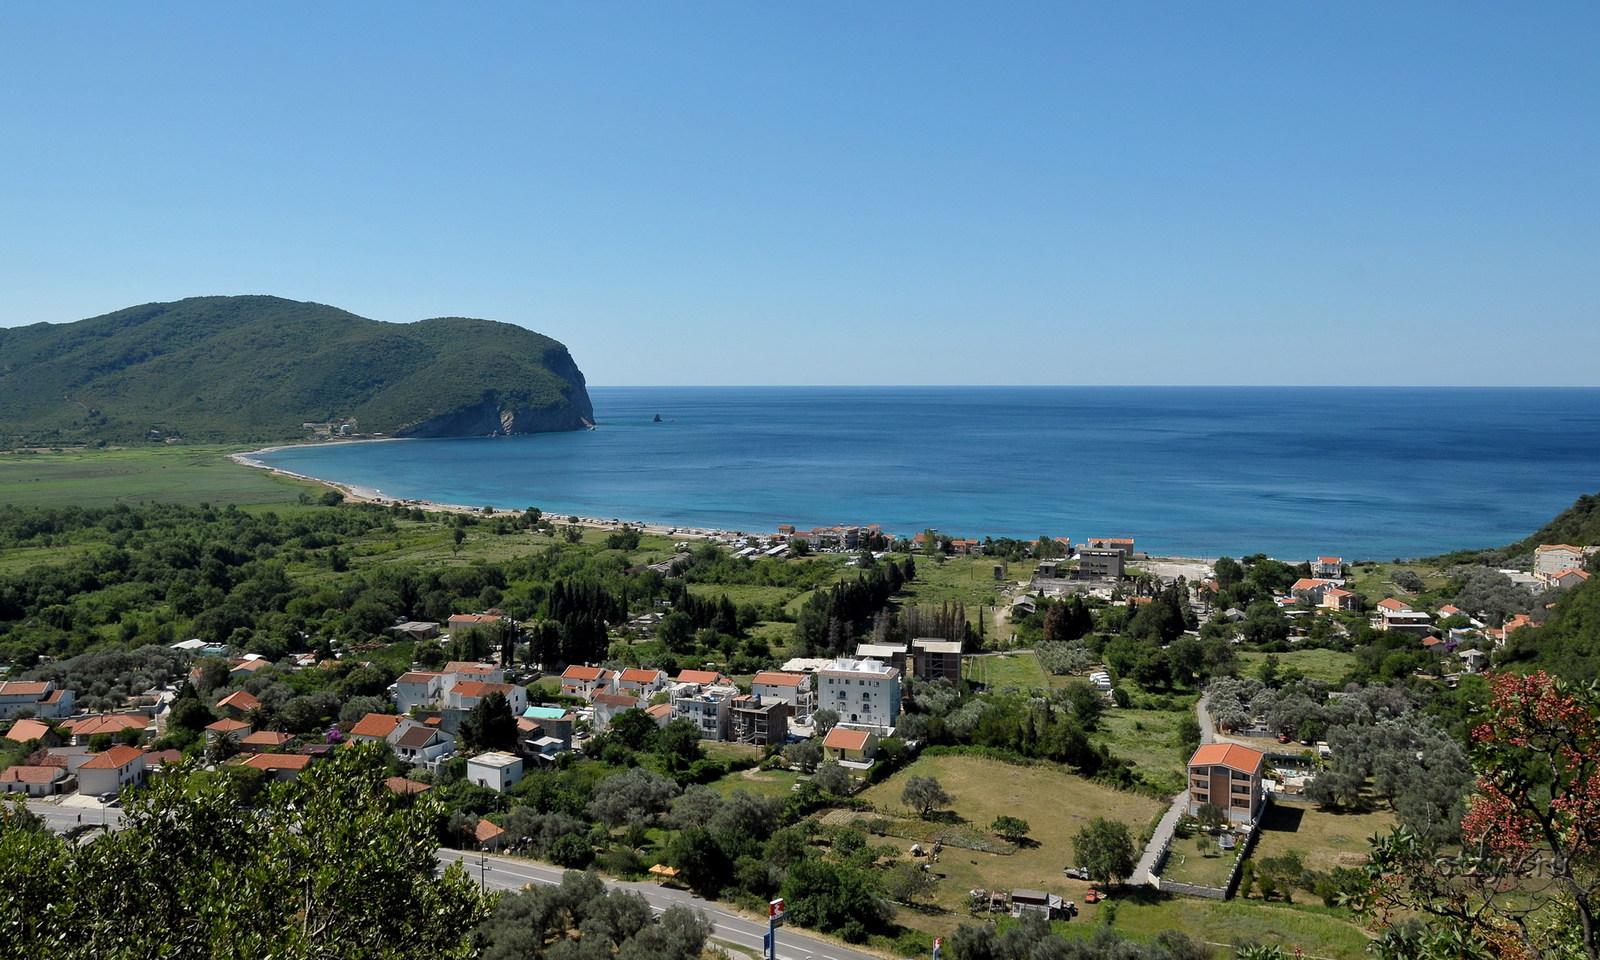 Недвижимость в Булярица недорого цены без посредников Булярицаса